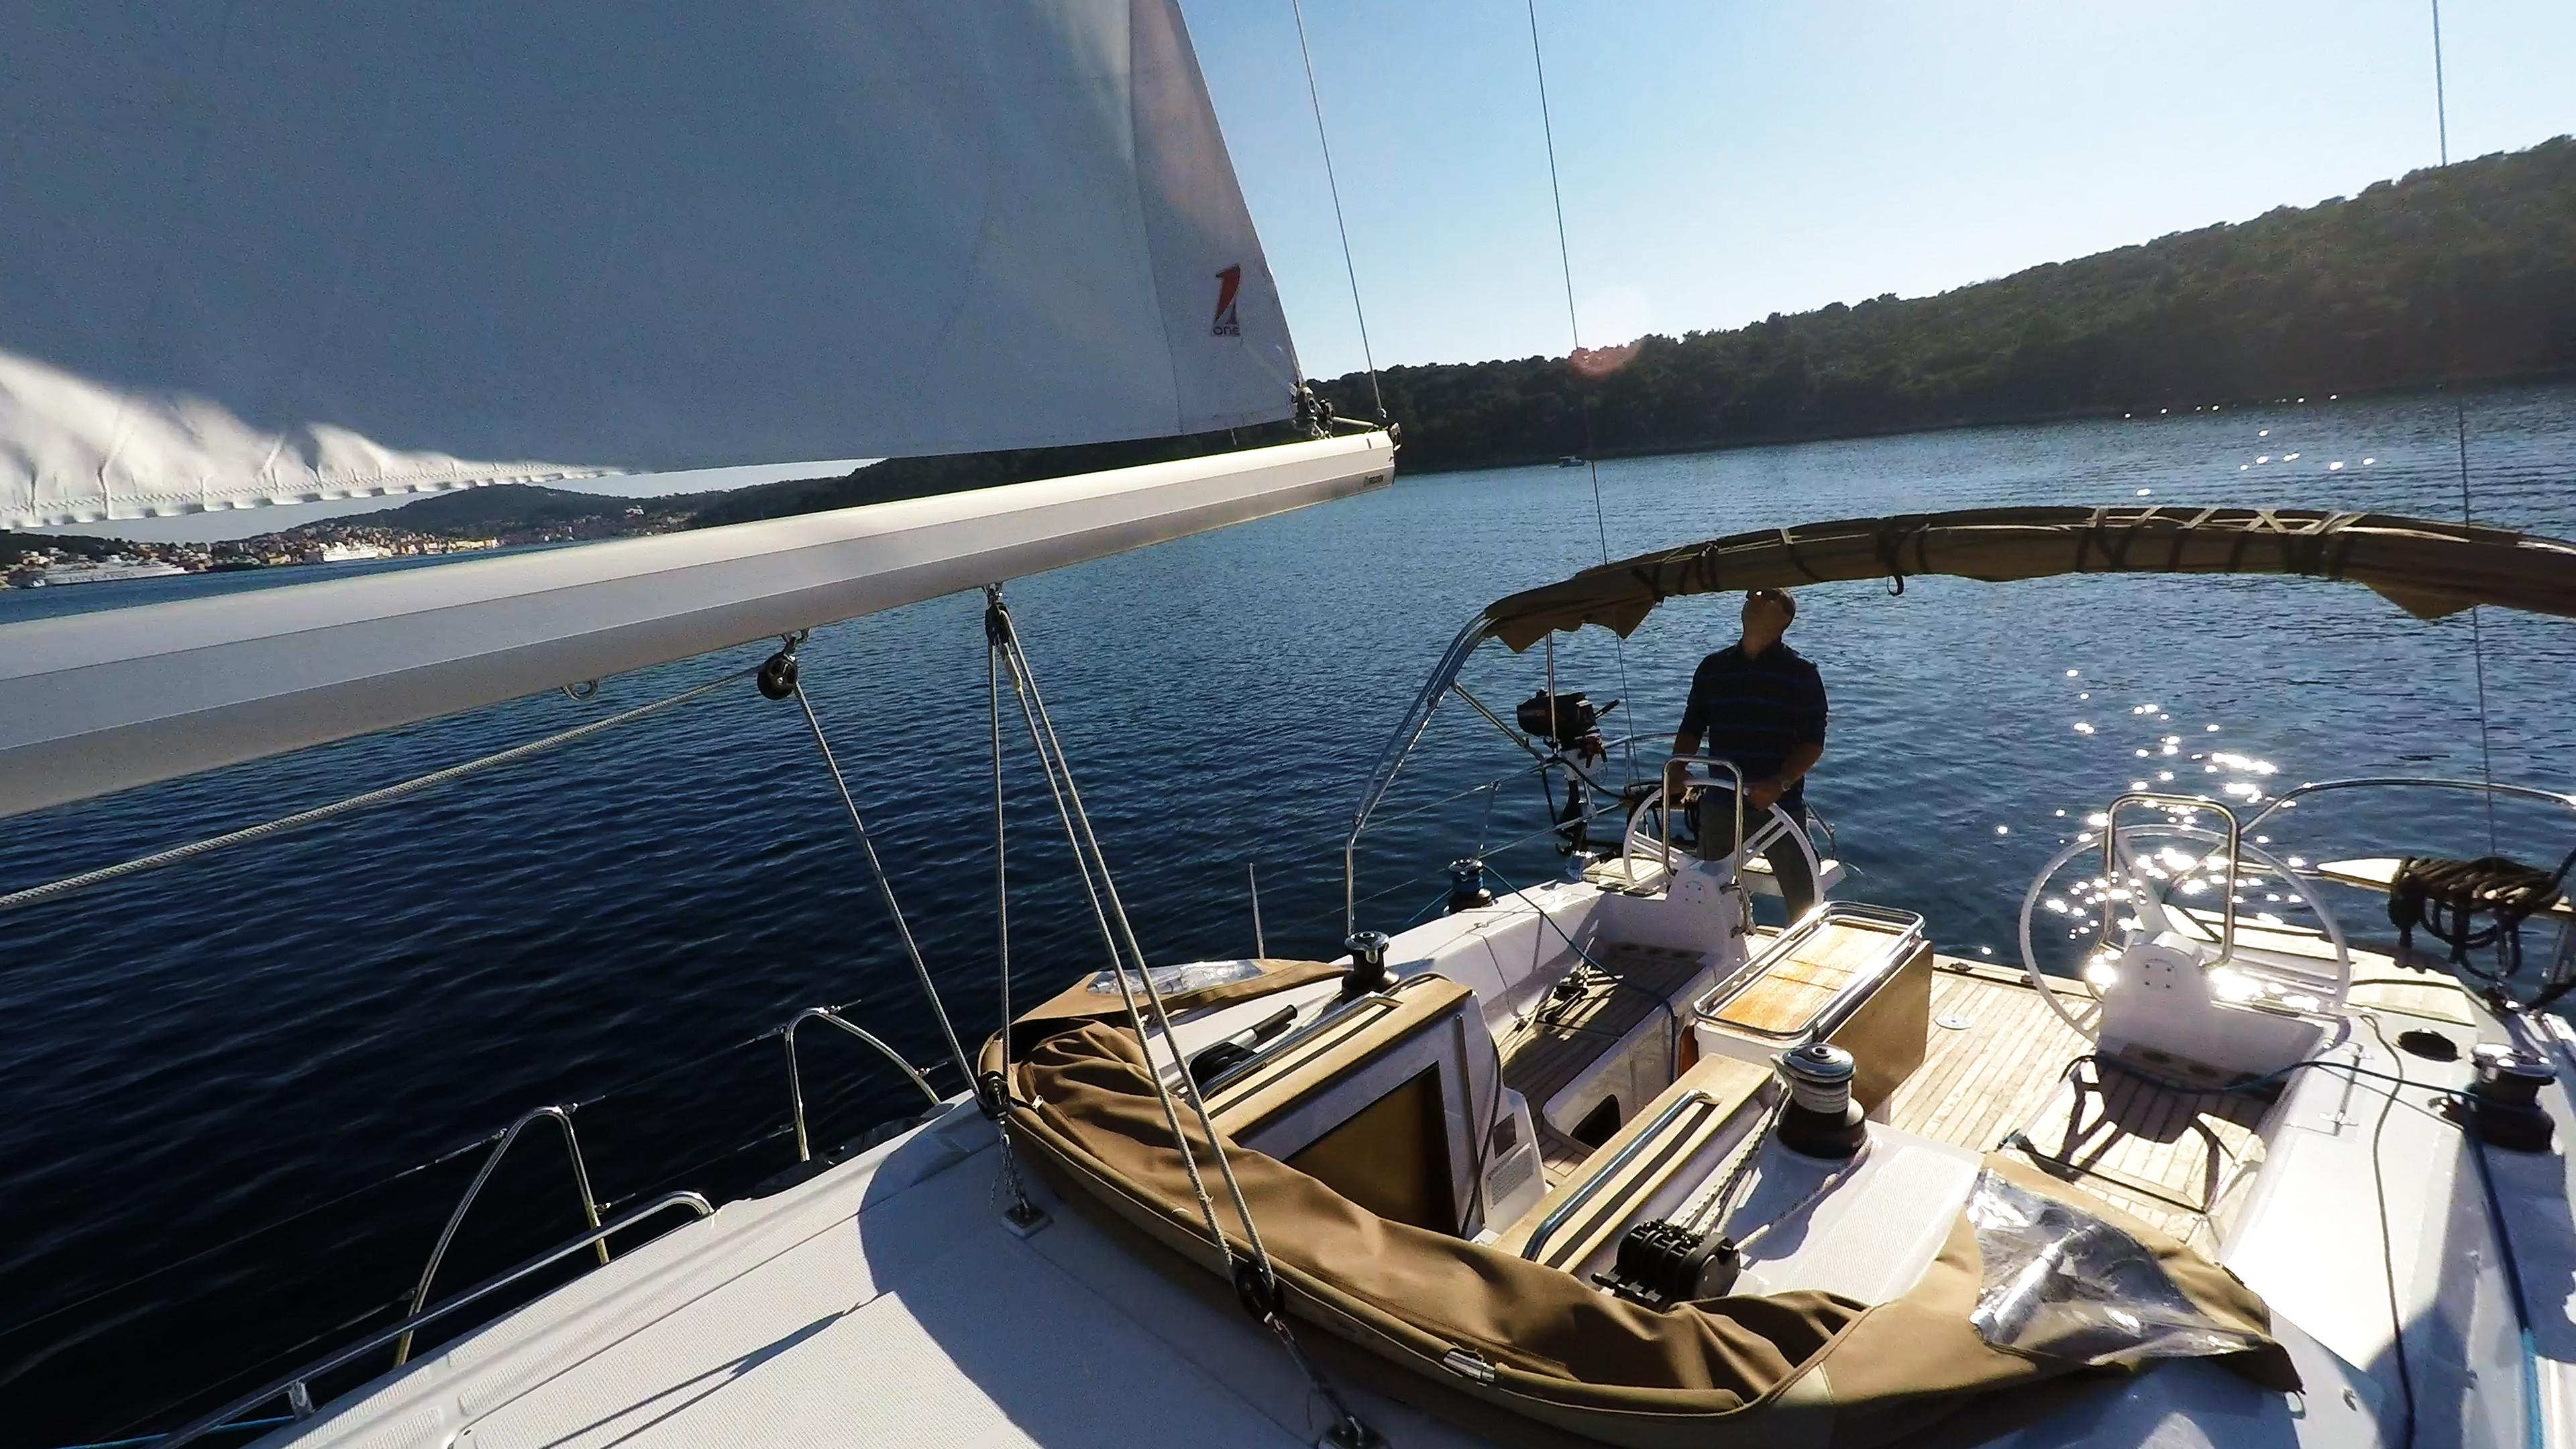 barcha a vela skipperin pozzetto timone ruota yacht a vela elan 45 impression